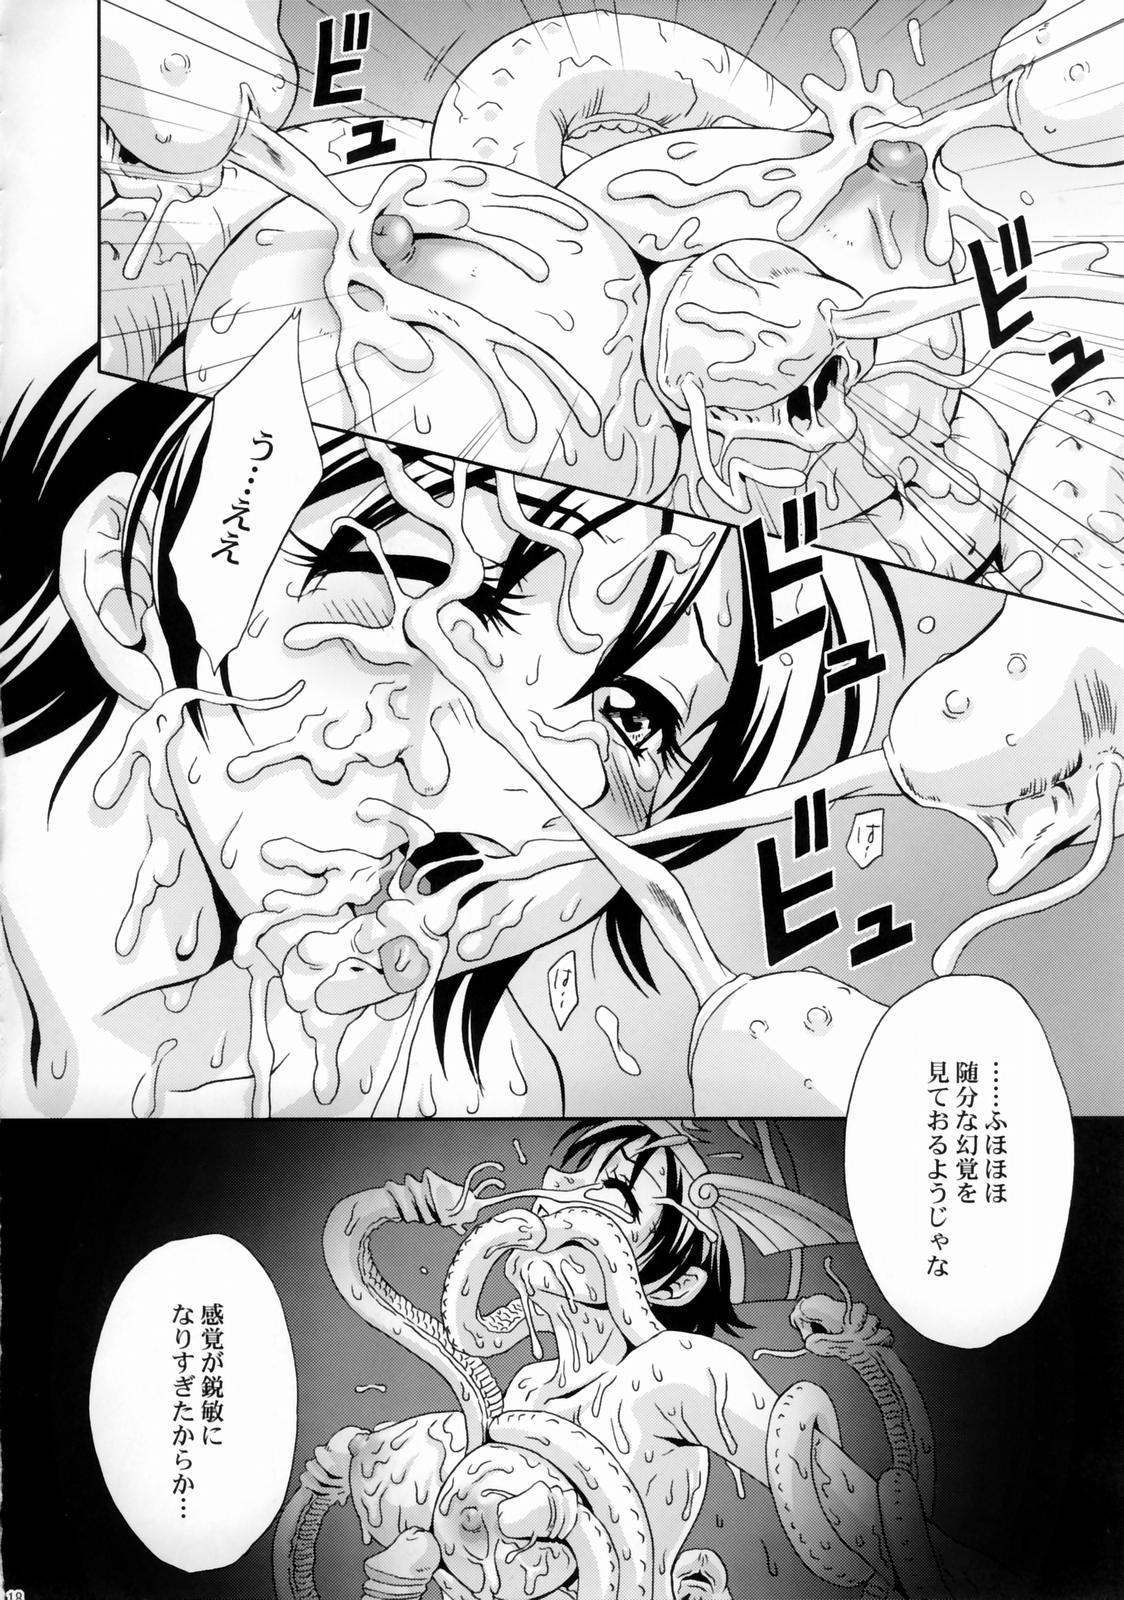 In Sangoku Musou Rikuson Gaiden 16